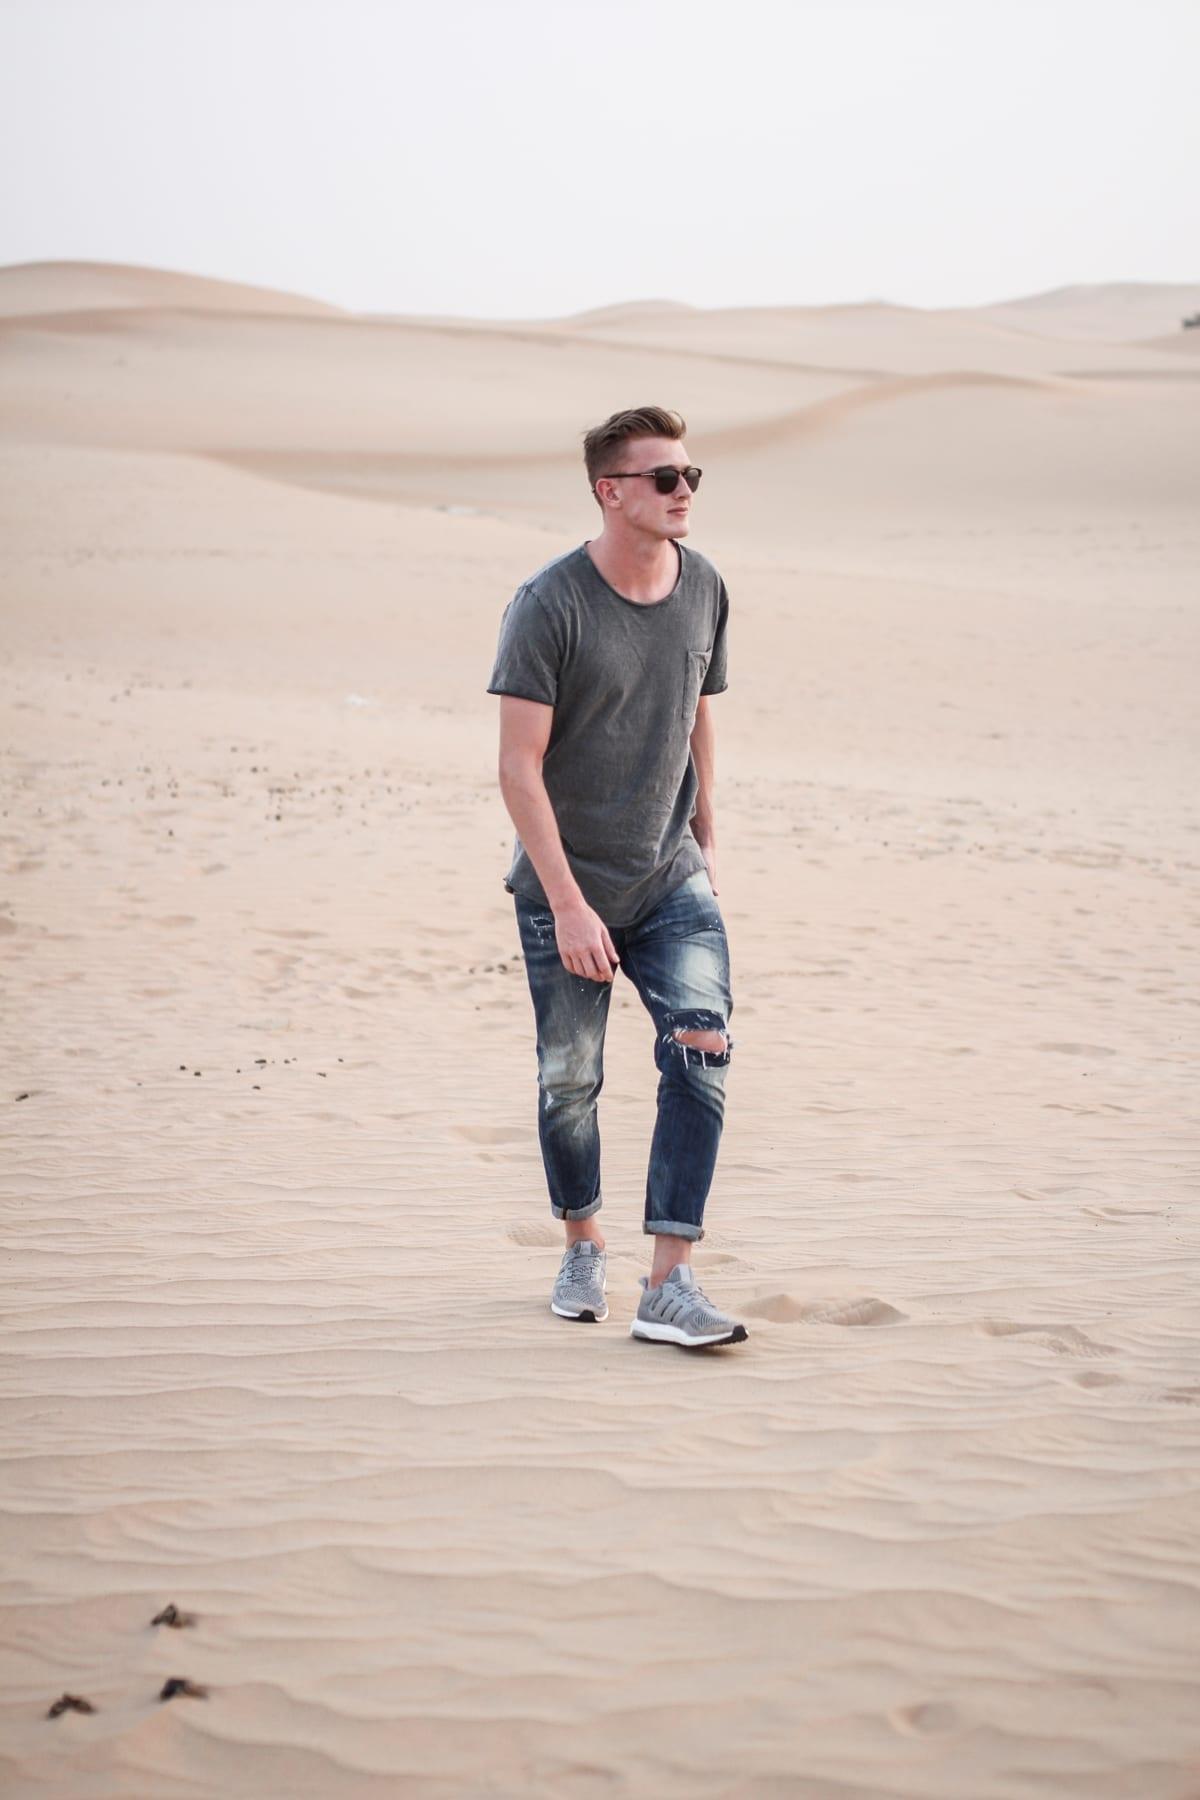 CK_1603_constantlyk_abu-dhabi-desert-fashion-travel-post-5311